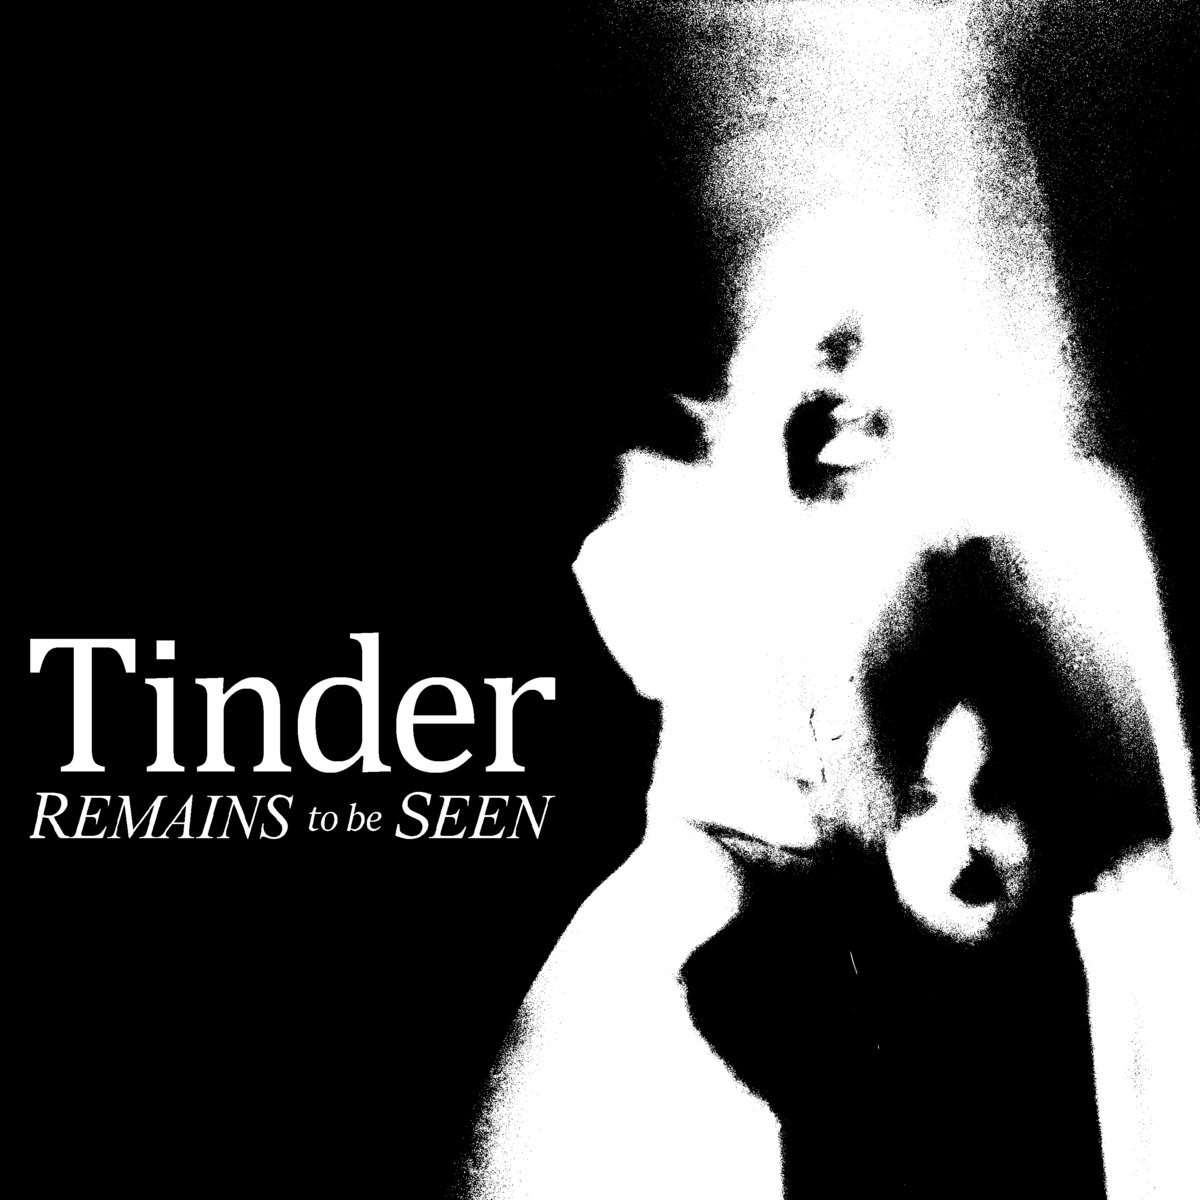 tinder seen